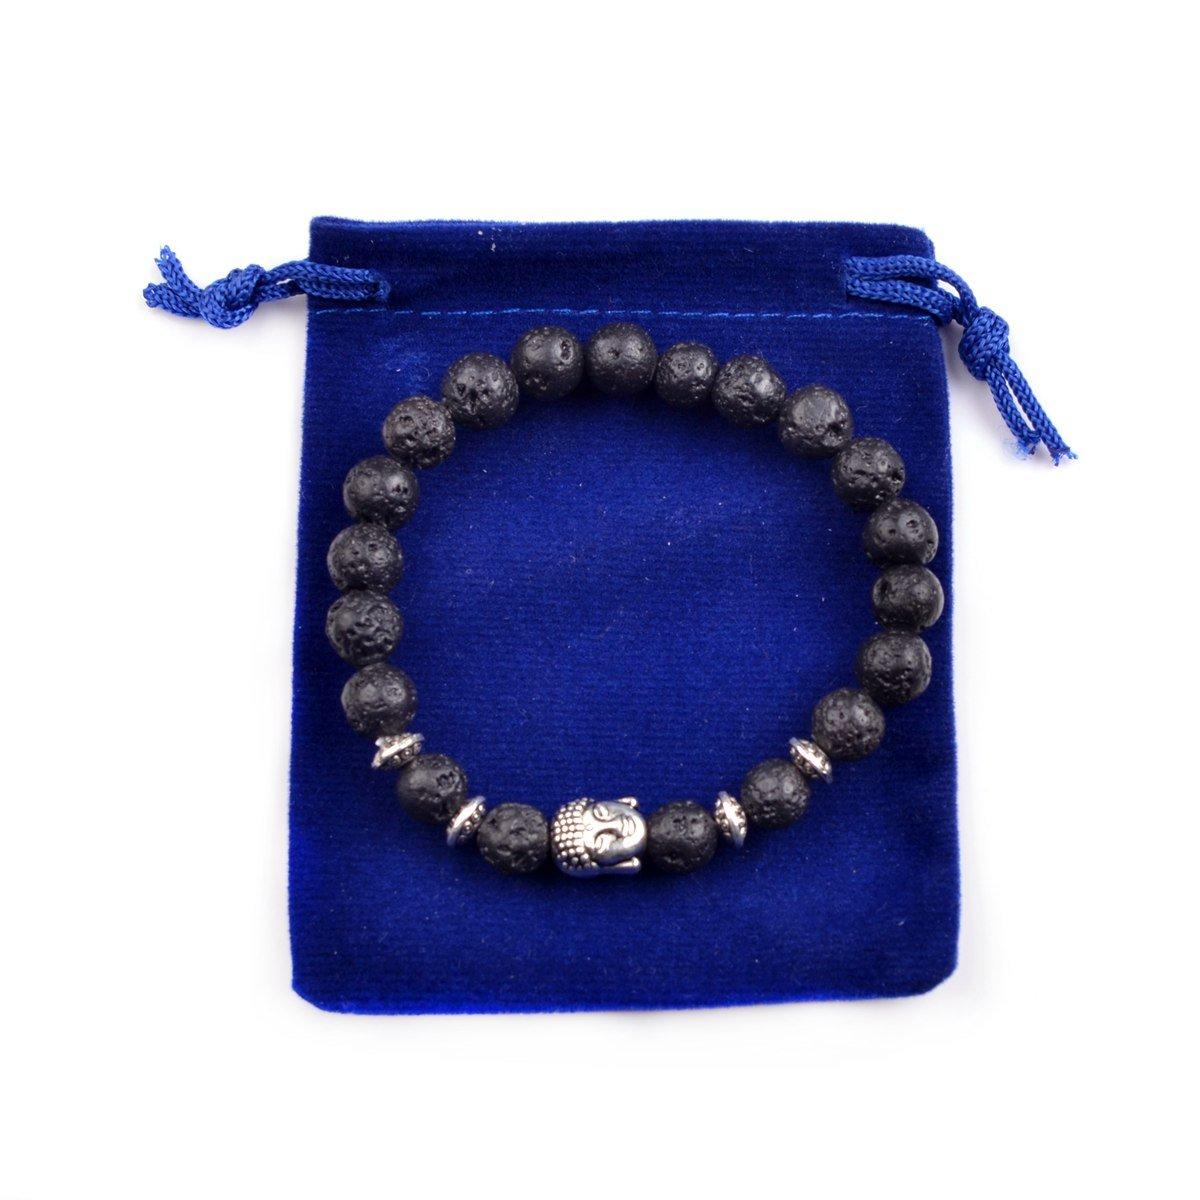 Joya Gift Buddha 8mm Beaded Bracelet for Women Men Gemstone Chakra Bracelet Jewelry for Birthday Gifts